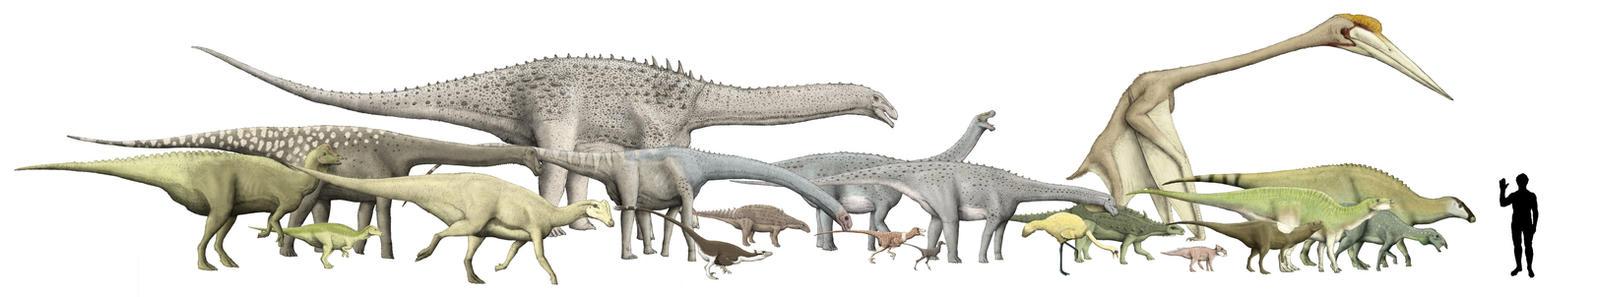 Island dinosaur size chart by Hyrotrioskjan